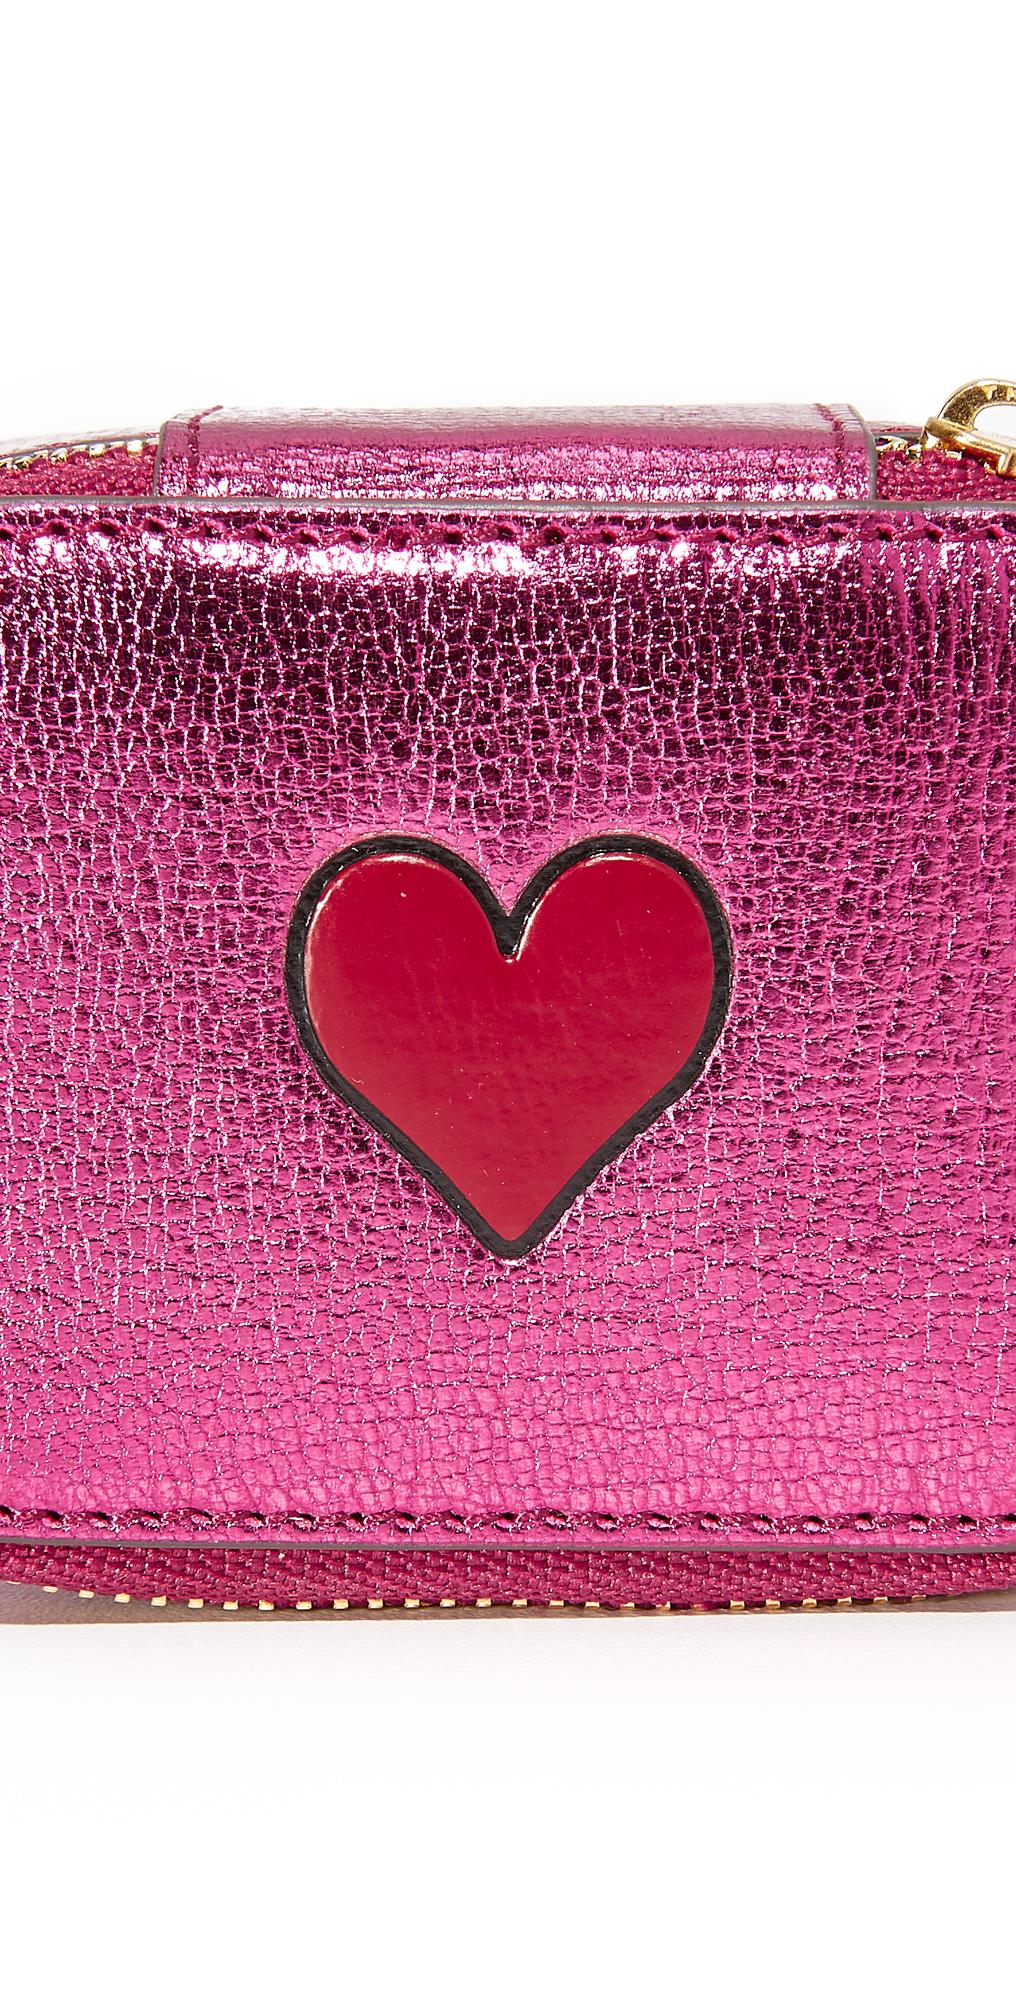 Anya Hindmarch Metallic Heart Pouch